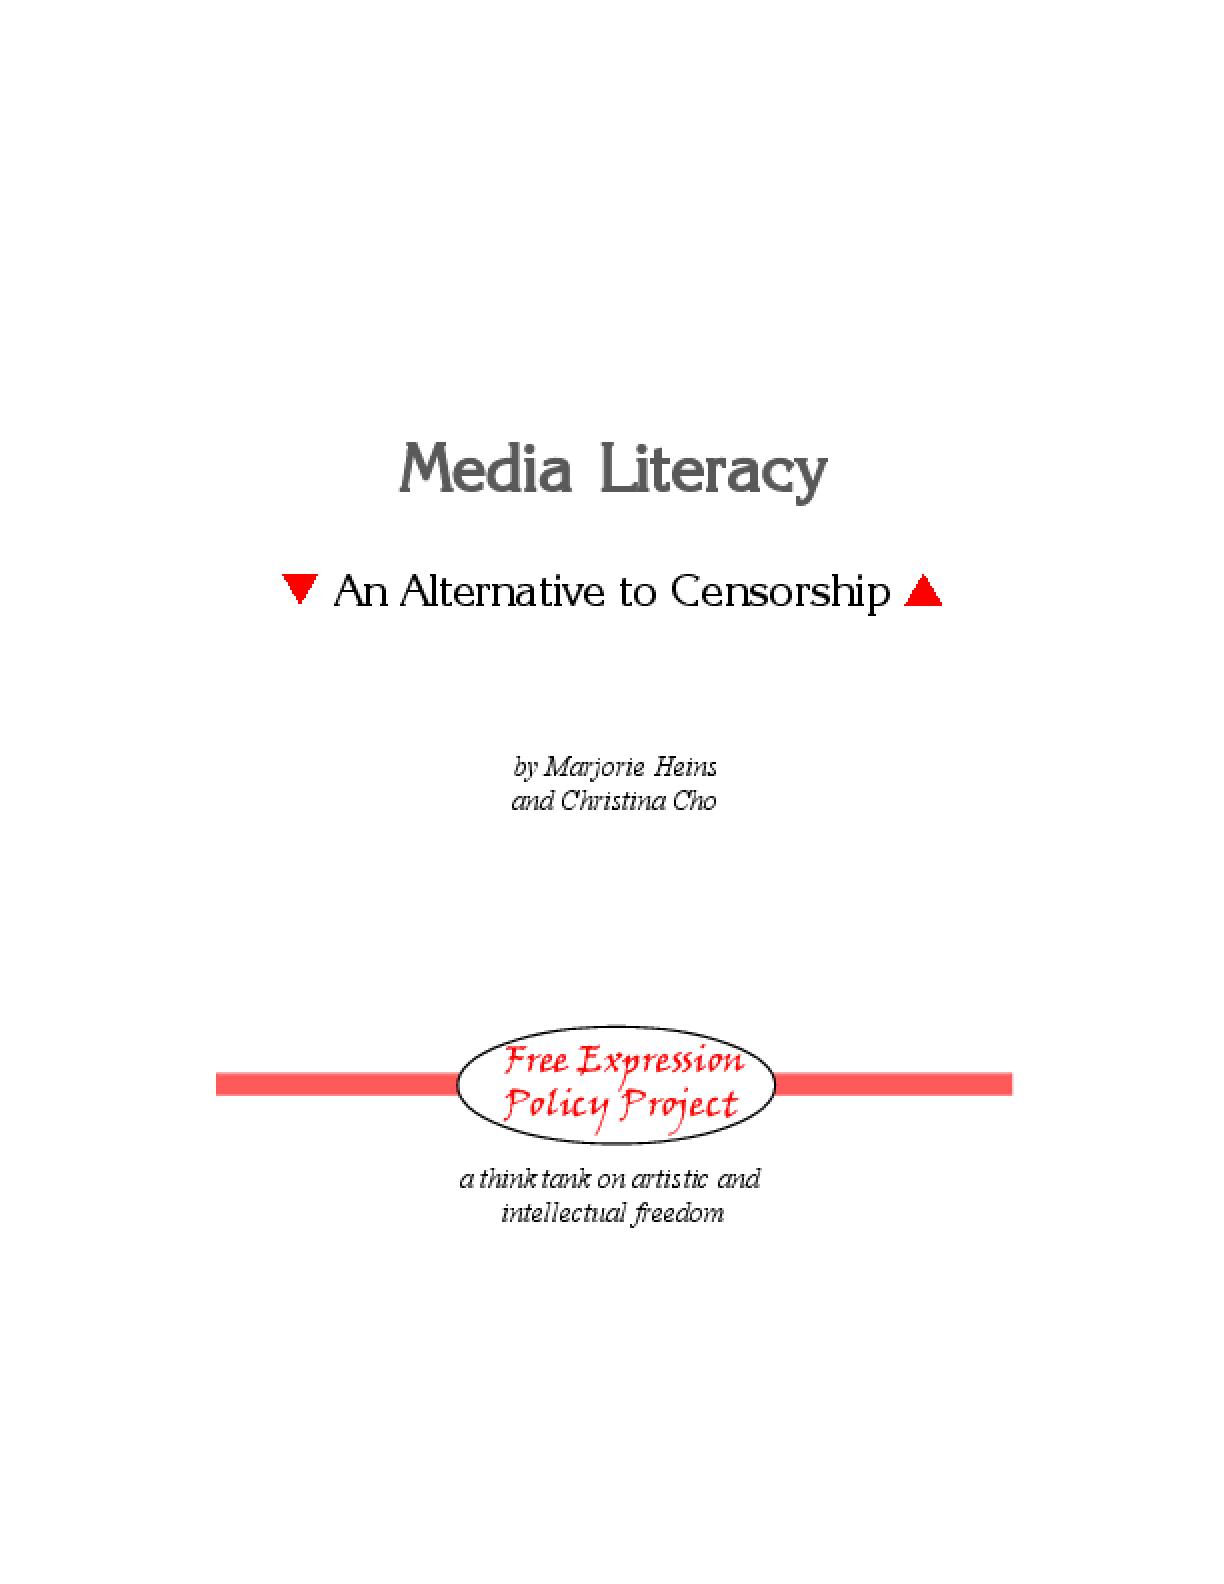 Media Literacy: An Alternative to Censorship